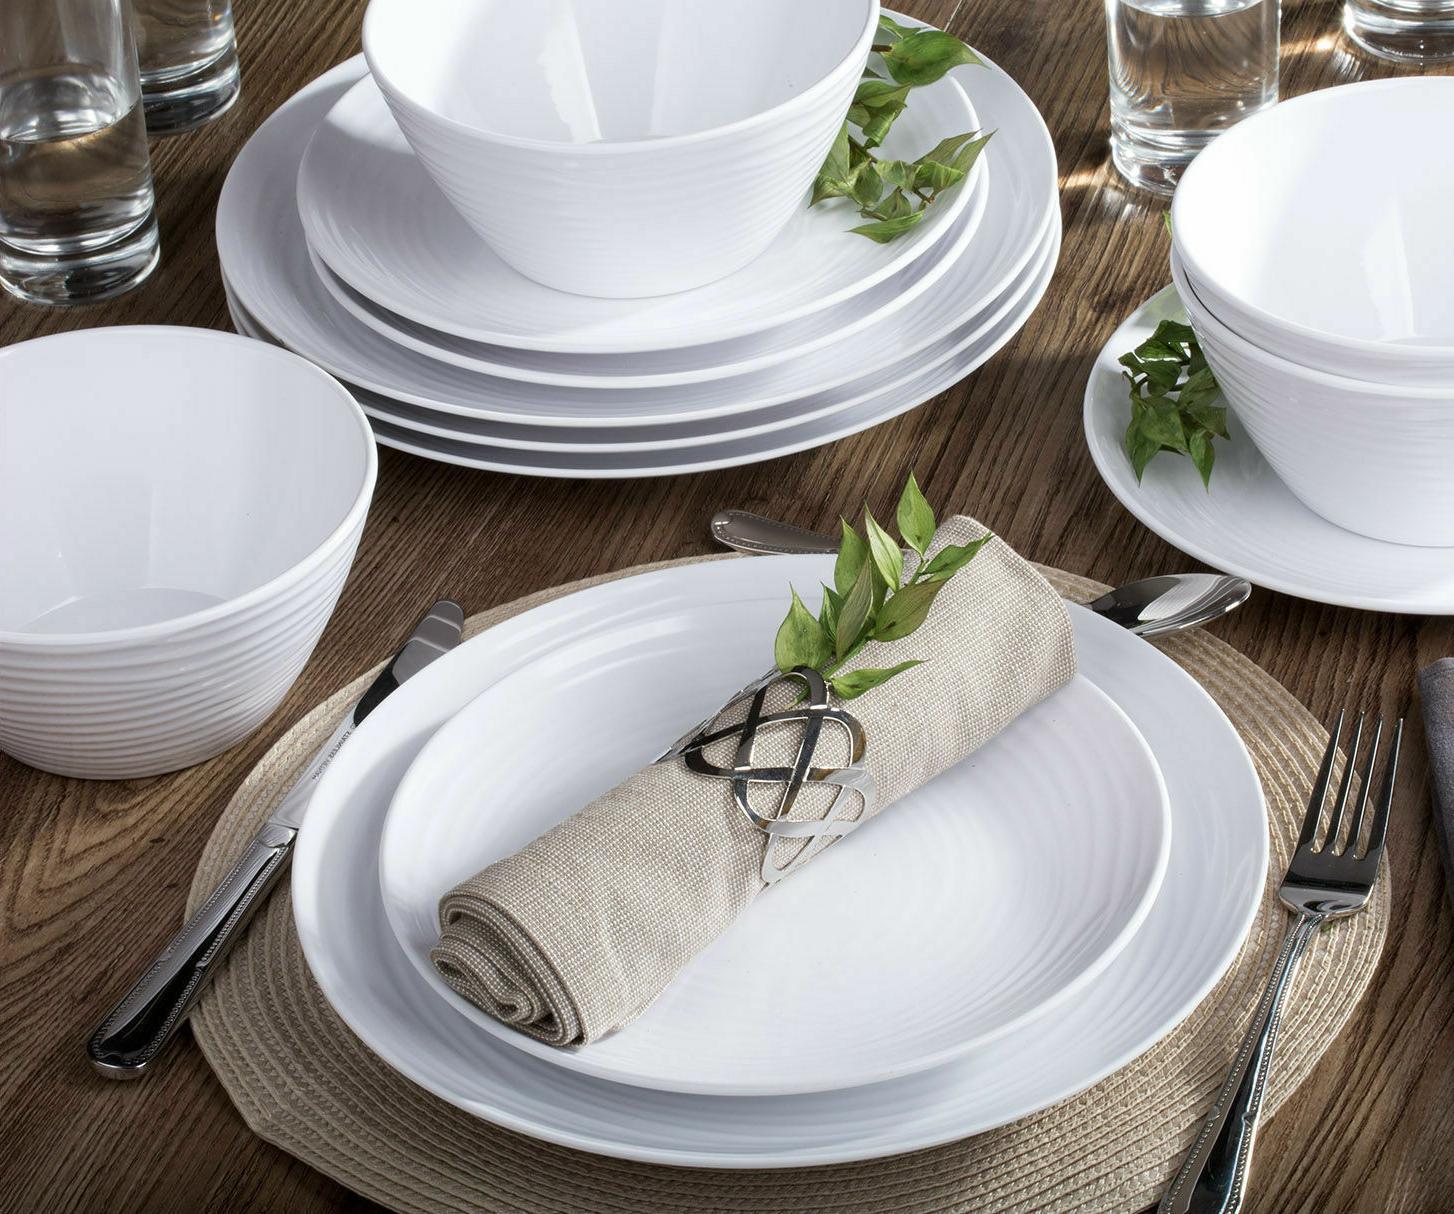 Parhoma White Melamine Home Dinnerware Set, 12-Piece Service